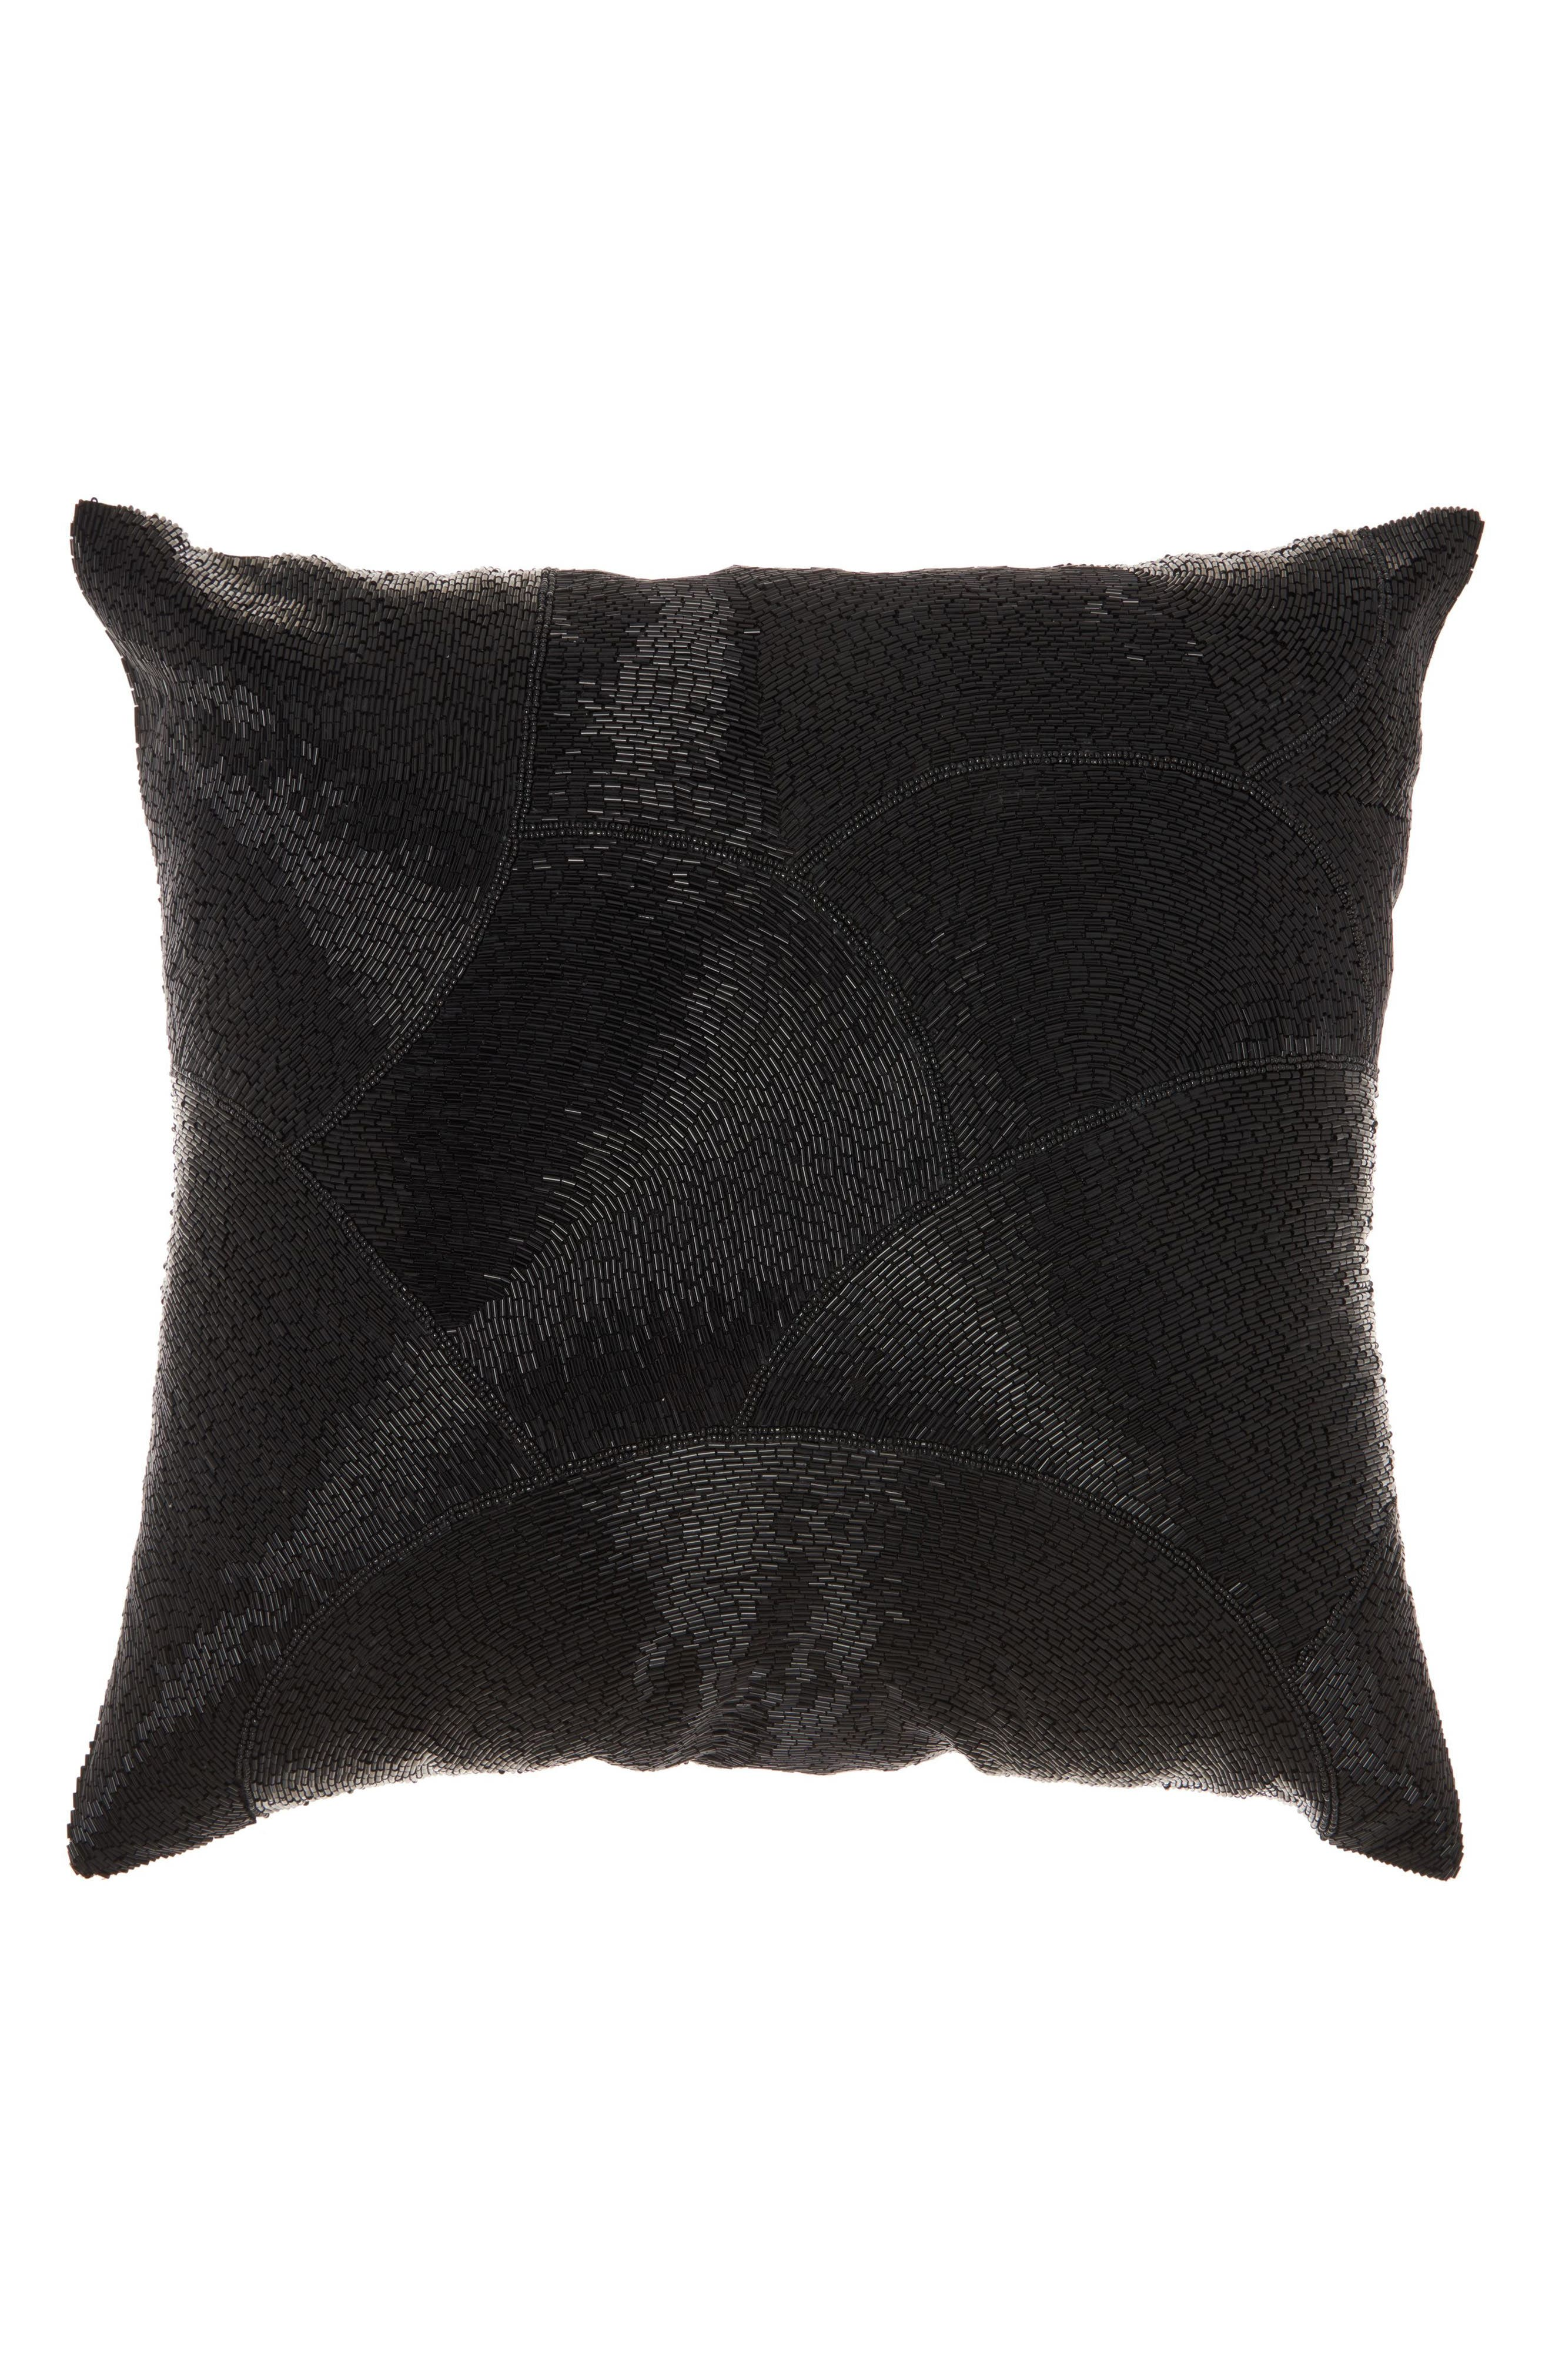 Beaded Fan Pillow,                             Main thumbnail 1, color,                             001